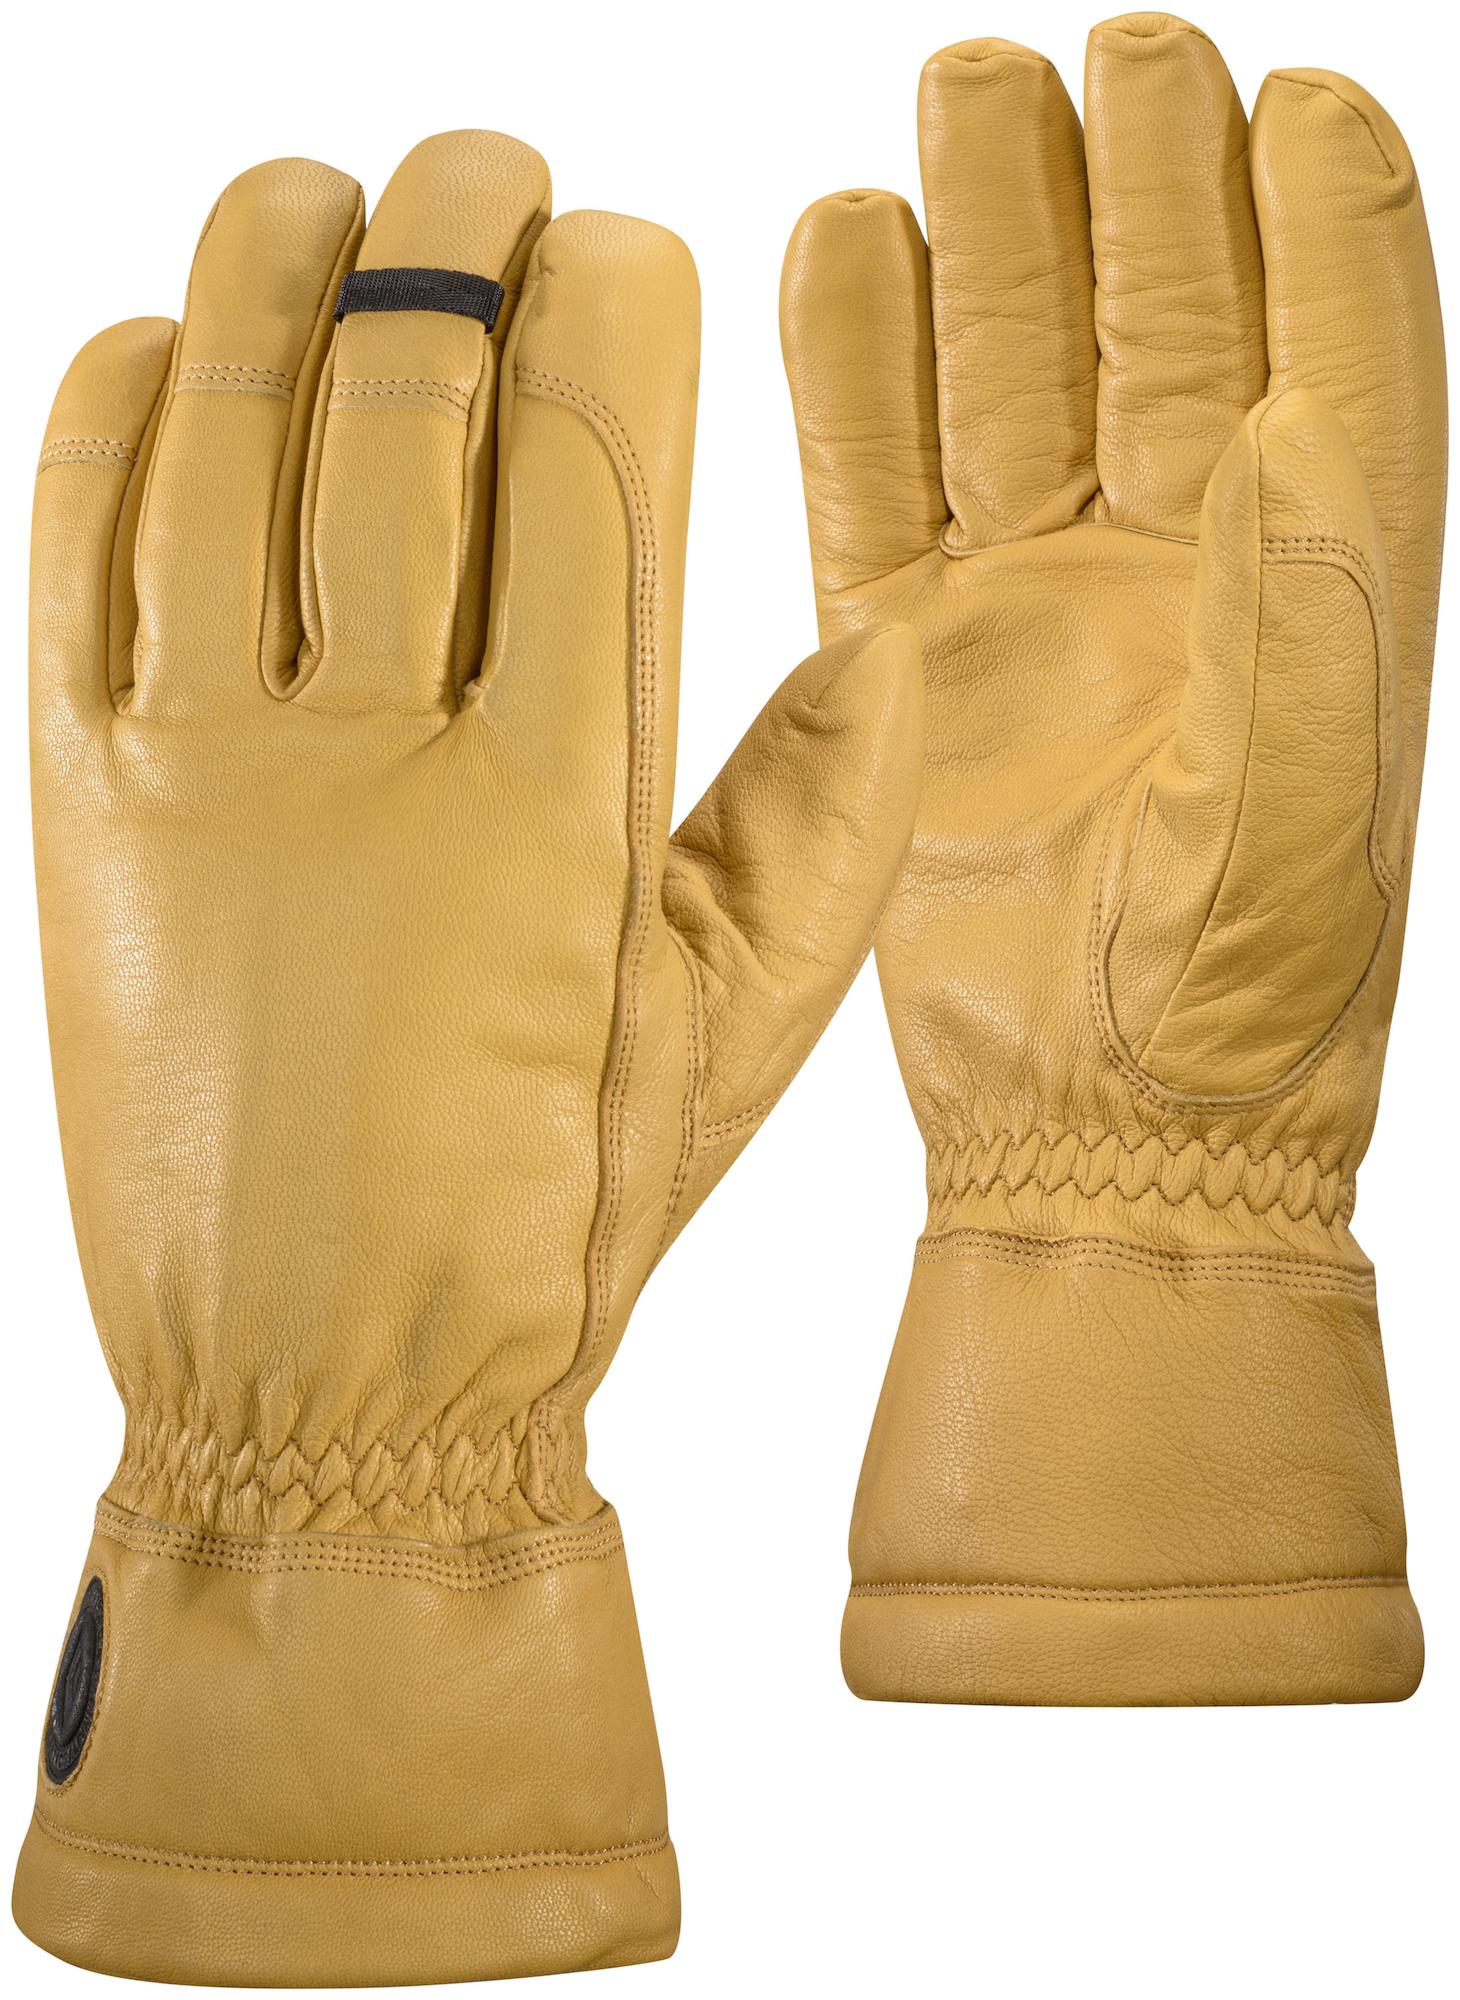 Black Diamond - Work Gloves - Gloves